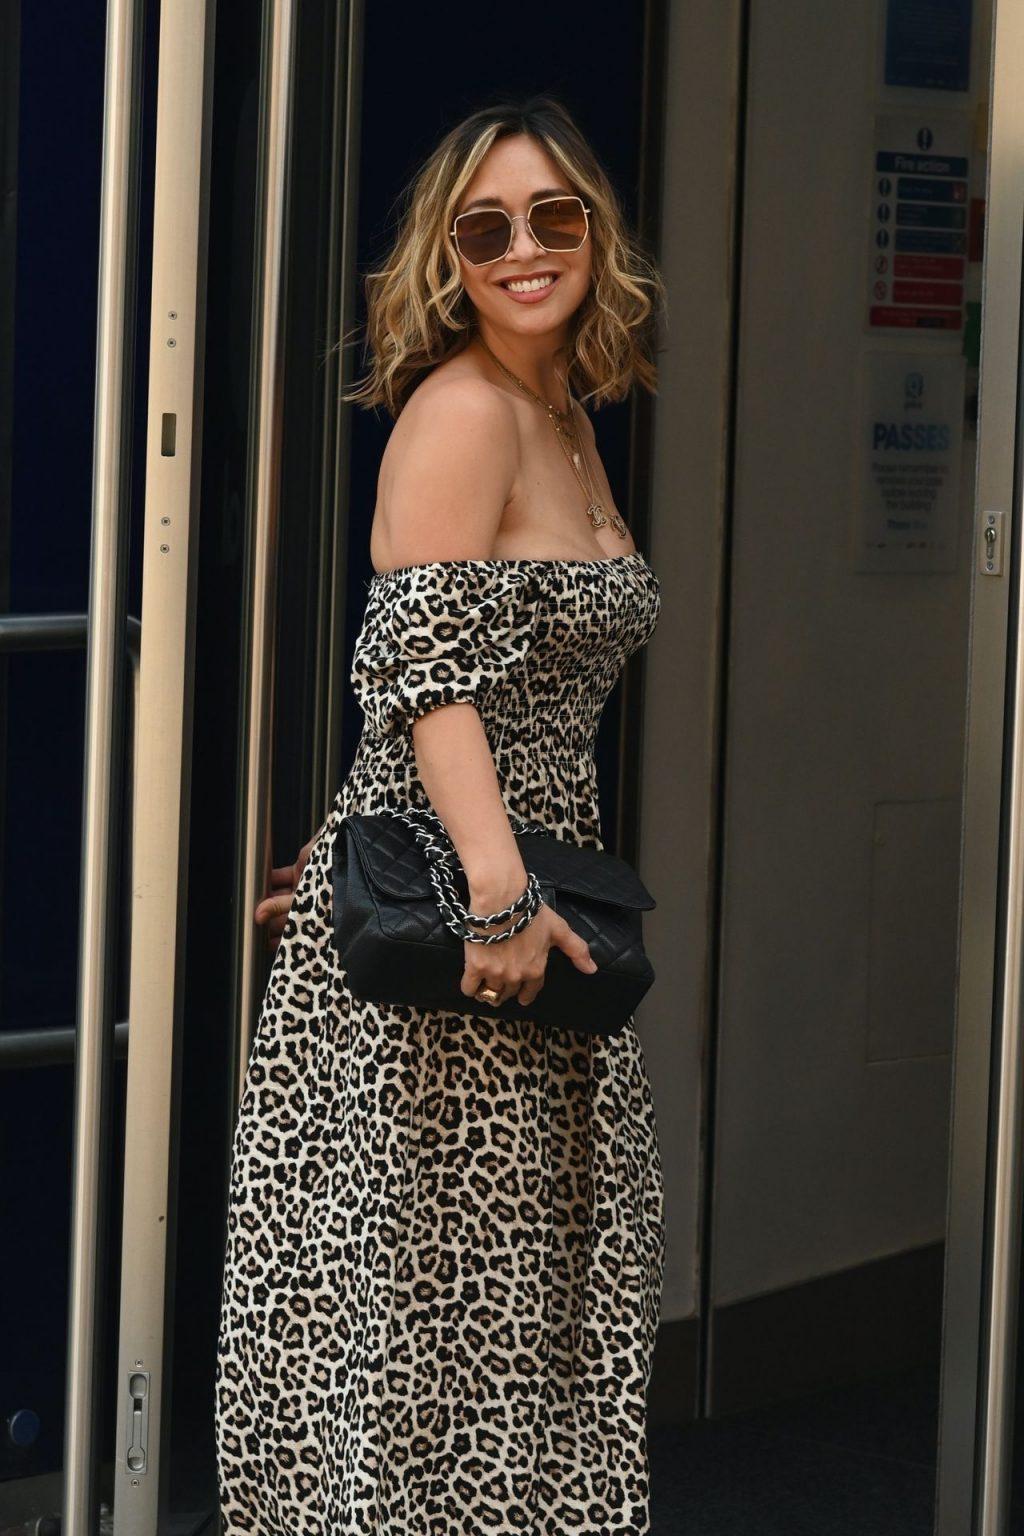 Myleene Klass Arrives Smooth Radio in a Leopard Print Maxi Dress (23 Photos)